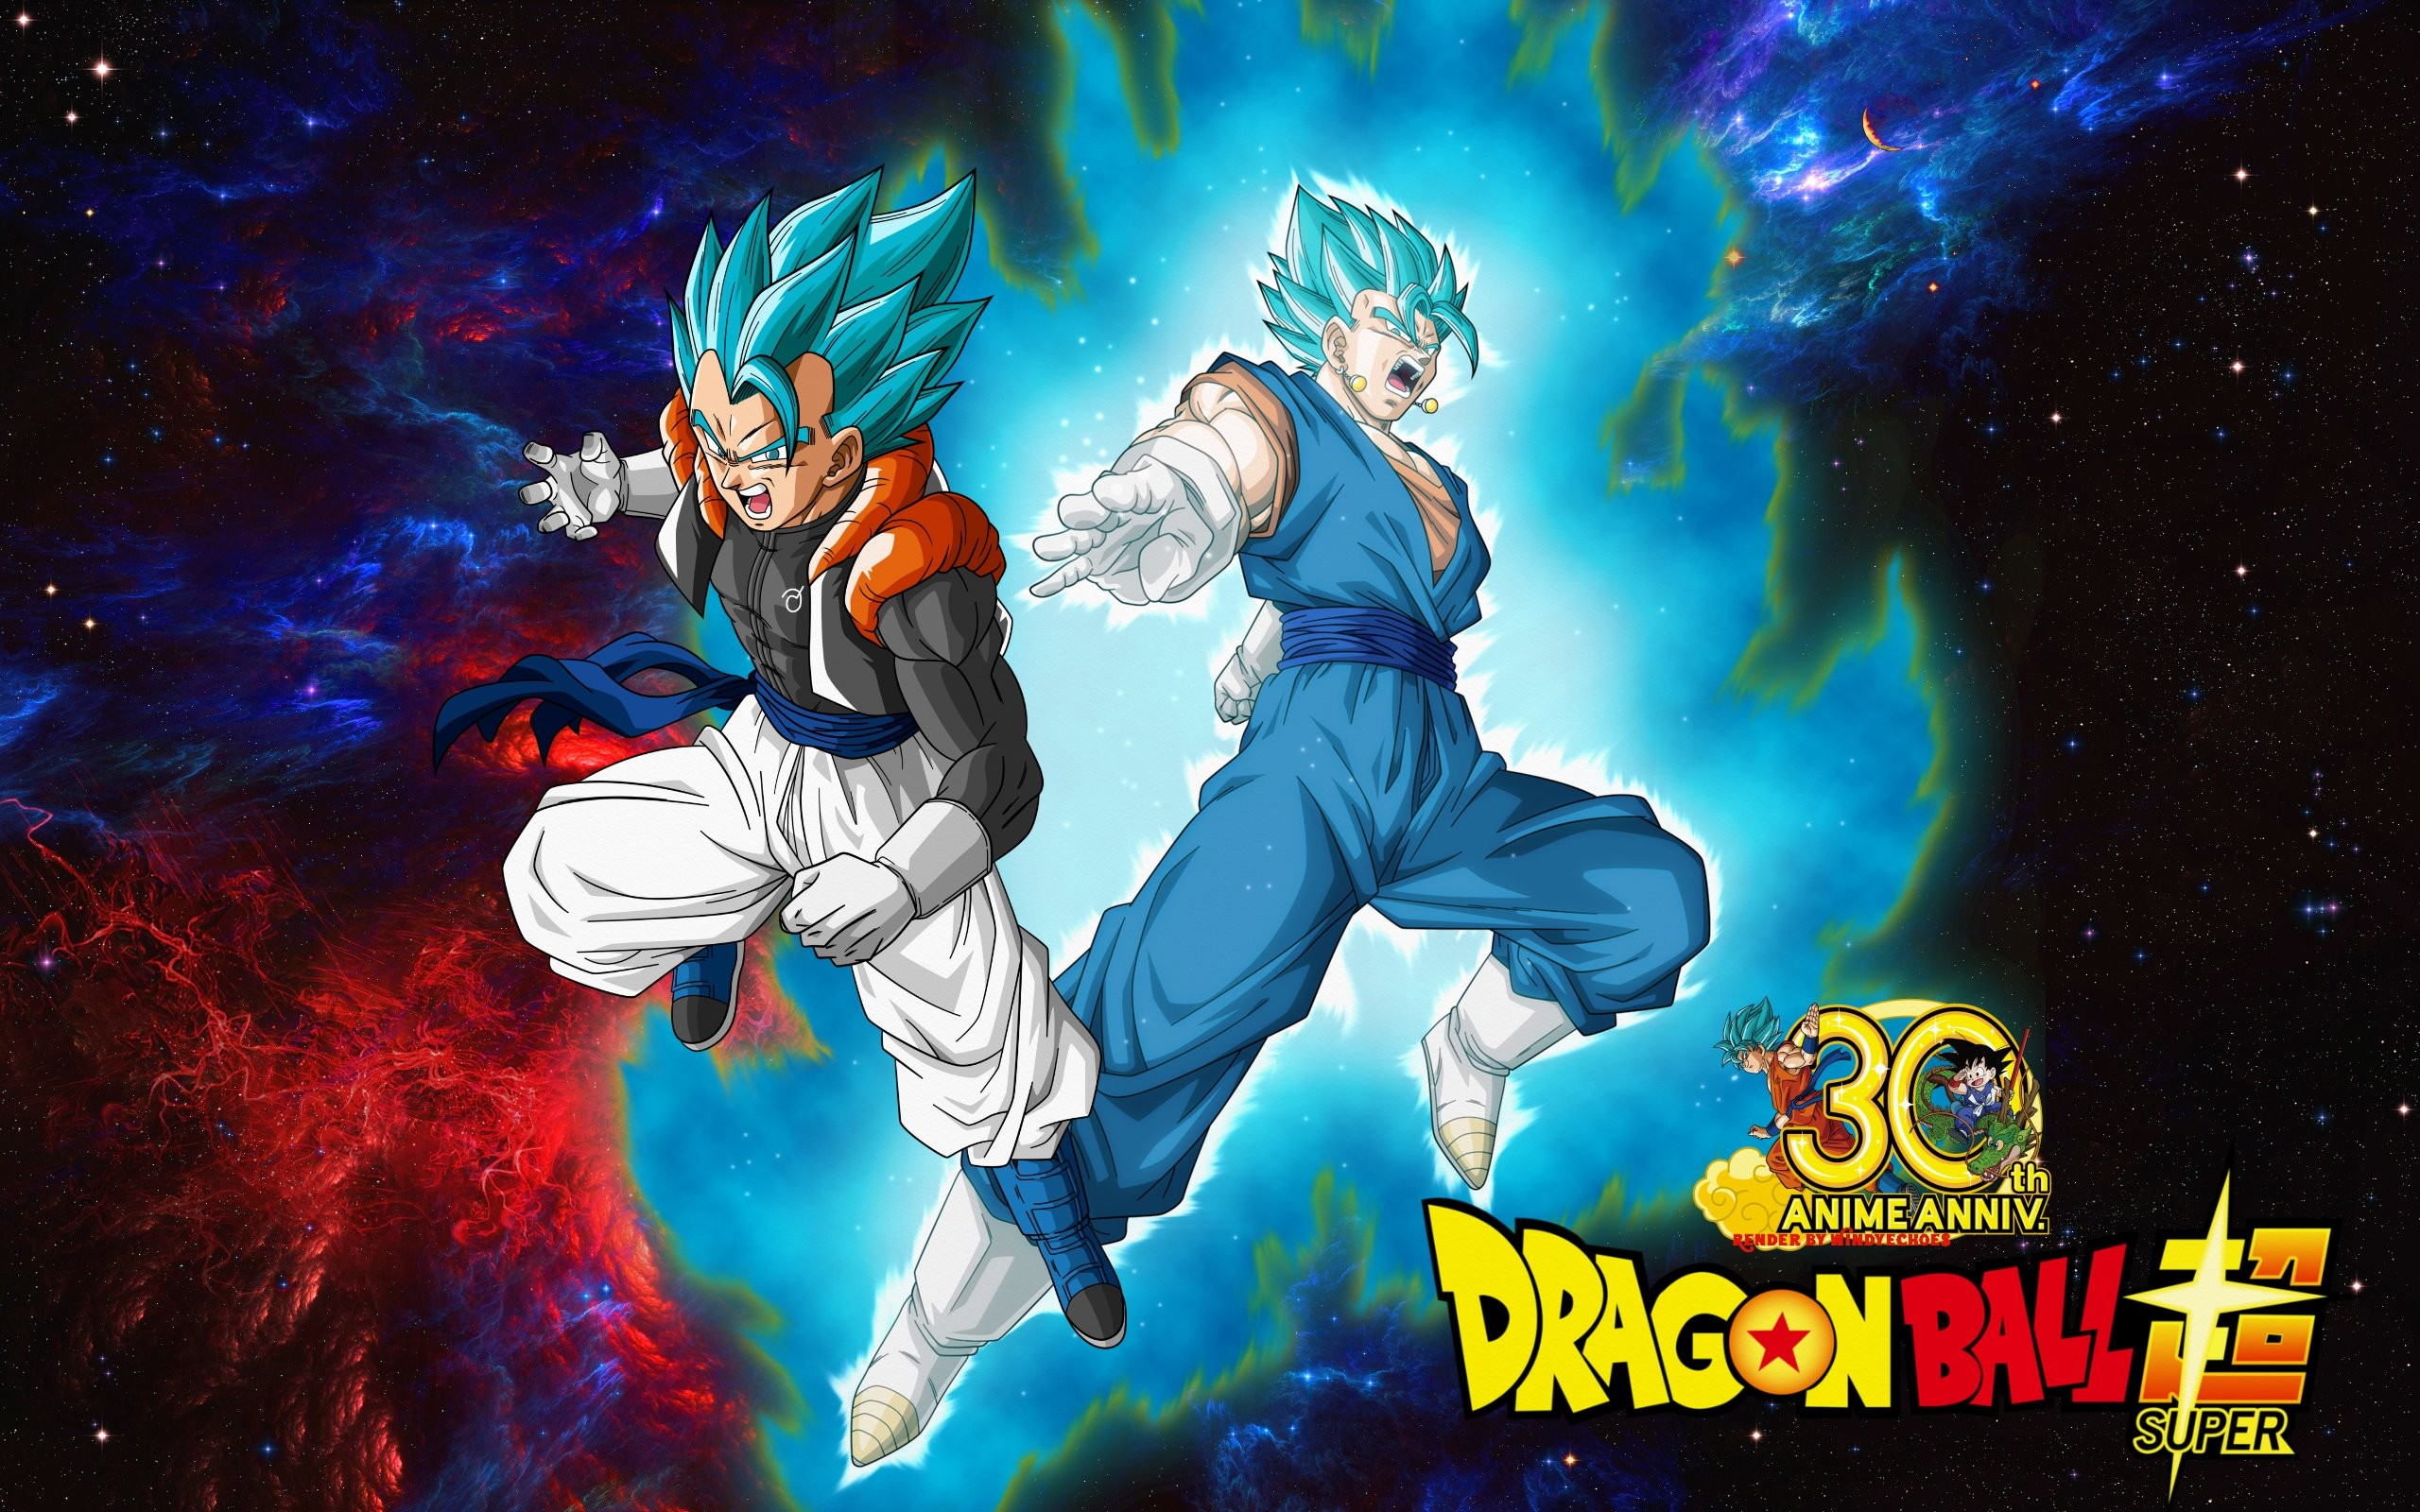 Super Saiyan Blue Fusion Wallpaper by WindyEchoes Super Saiyan Blue Fusion  Wallpaper by WindyEchoes